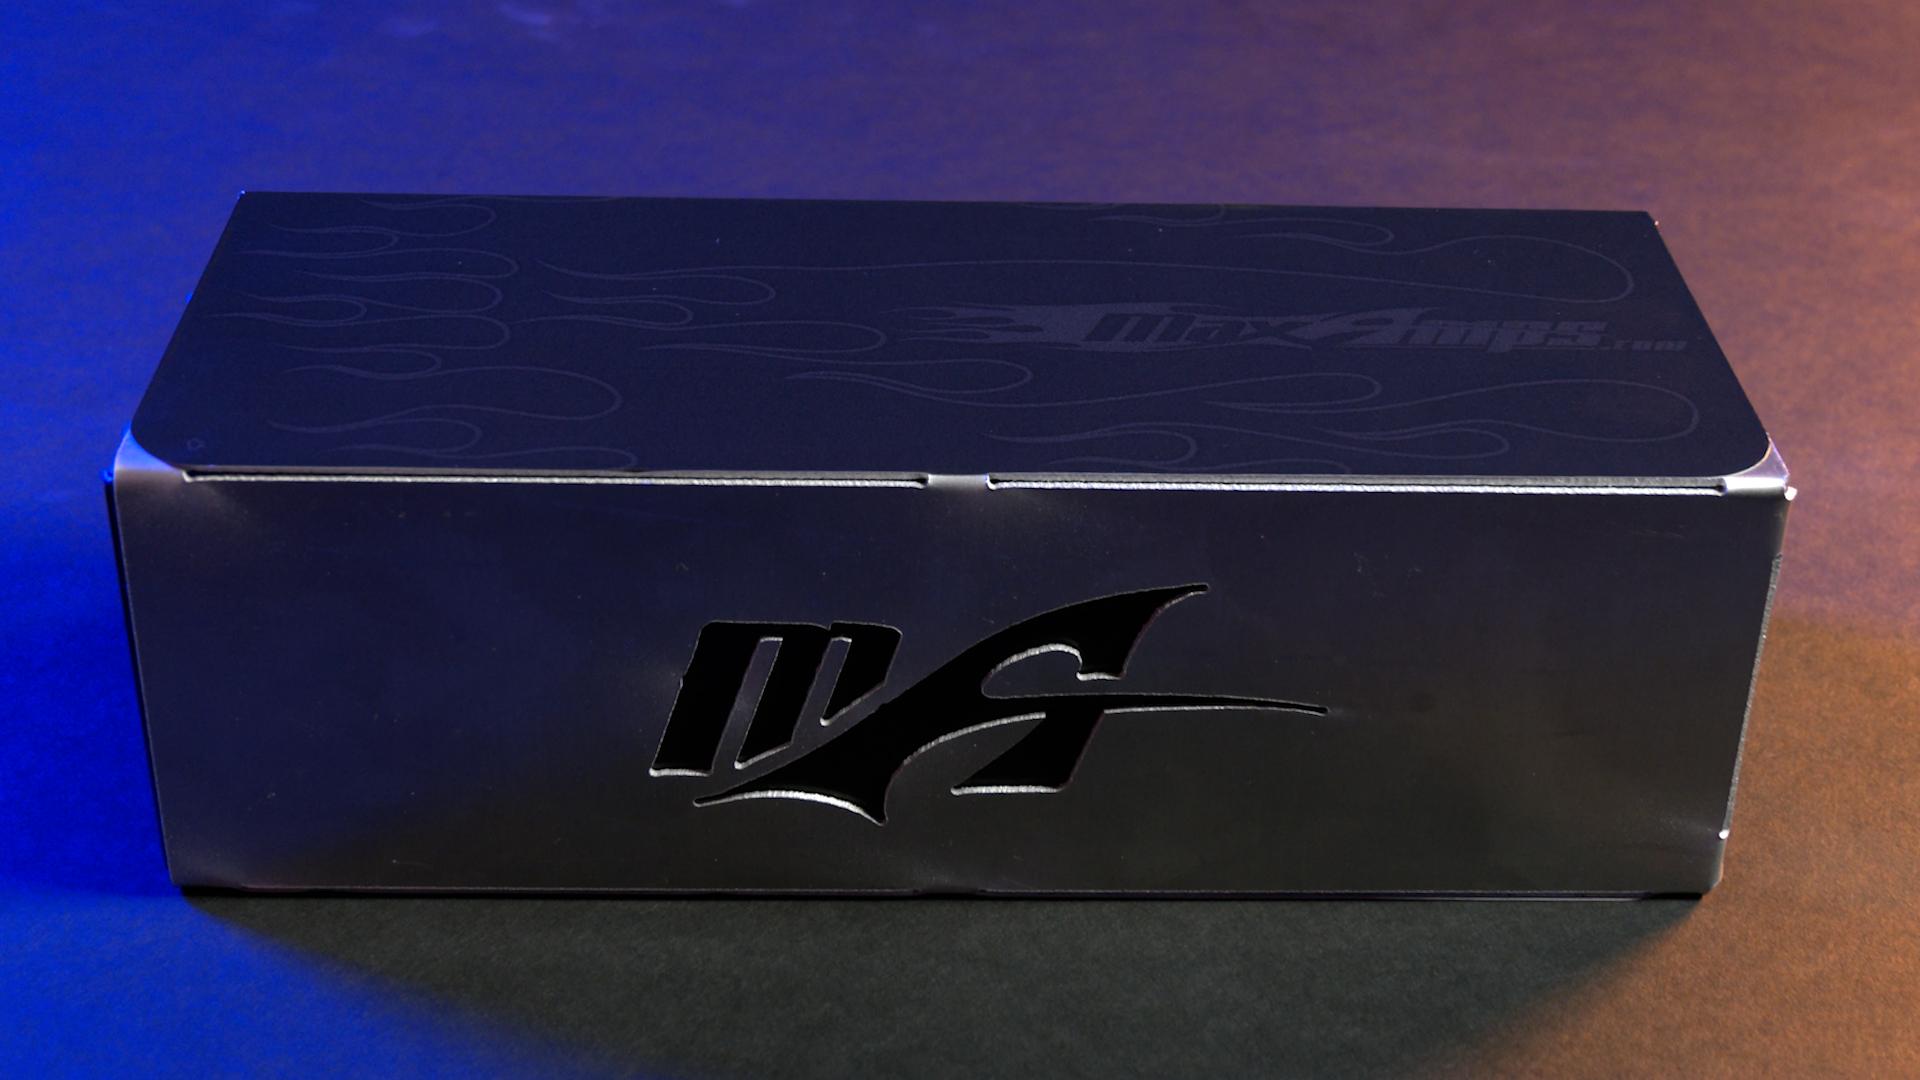 MaxAmps Metal MaxBox For LiPo Battery Packs